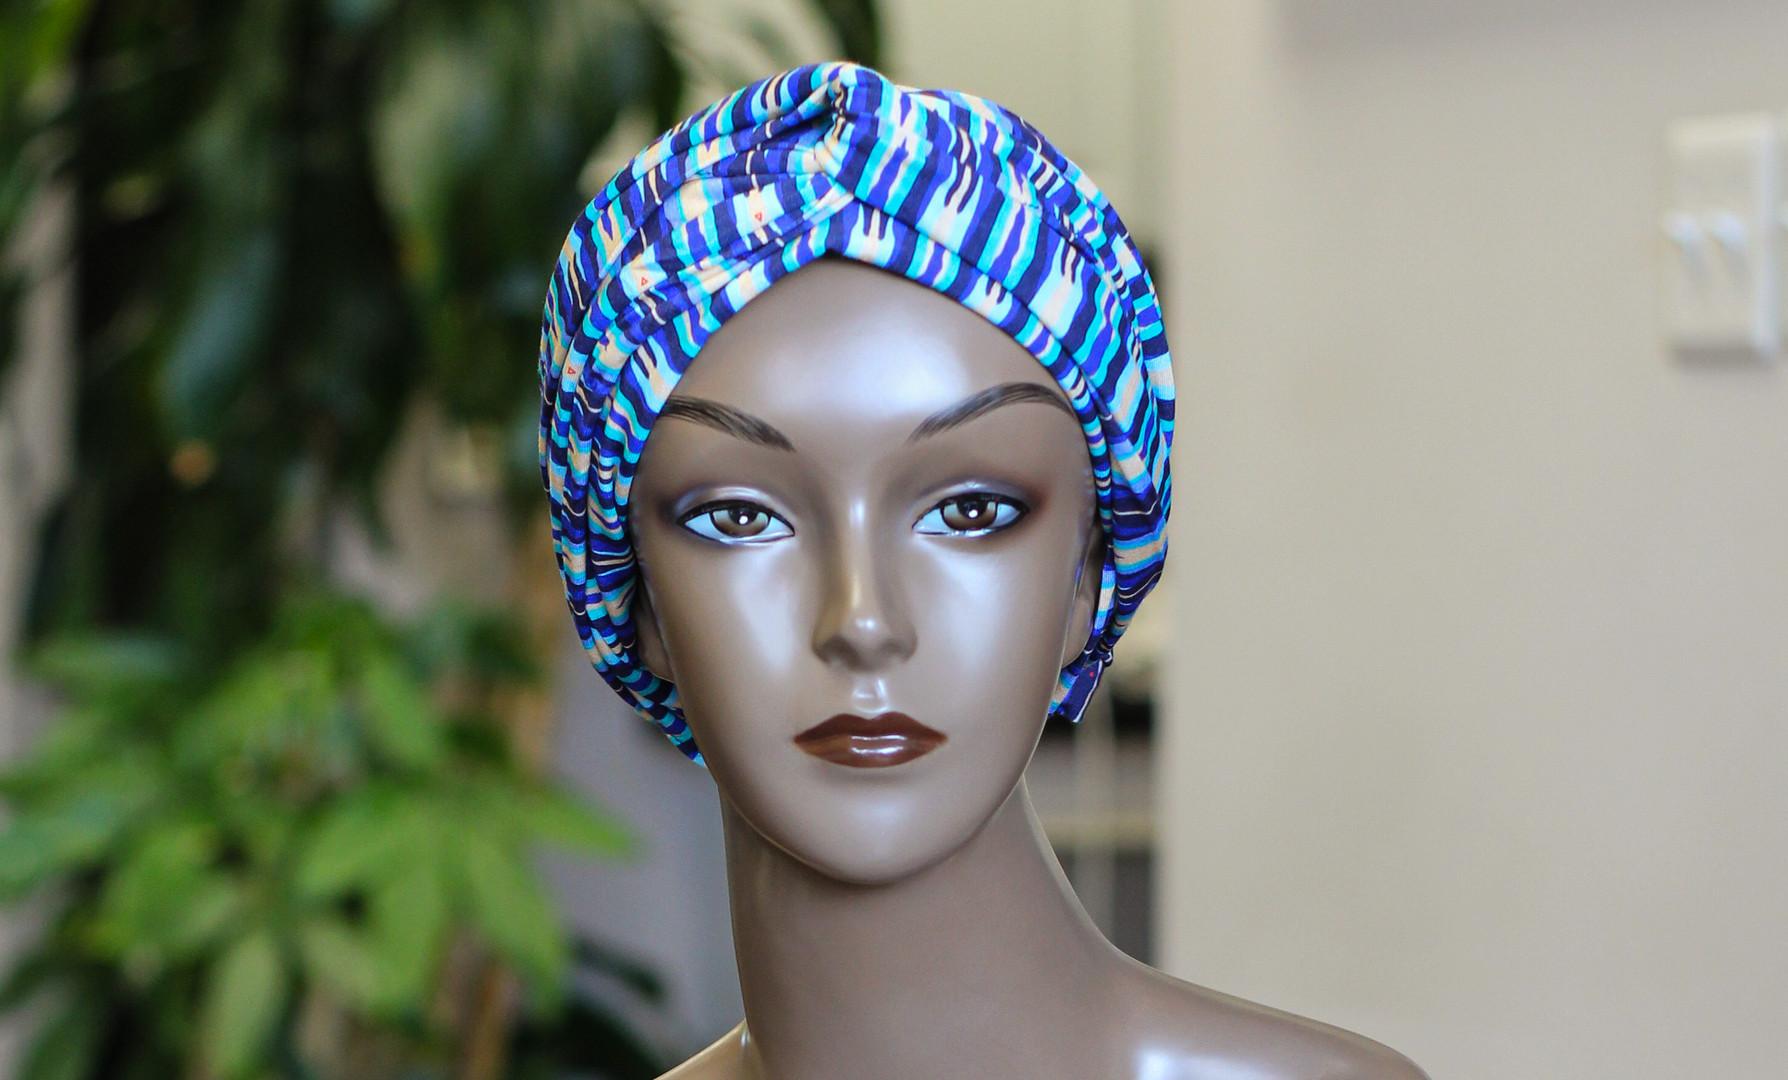 Long Tailed Turban